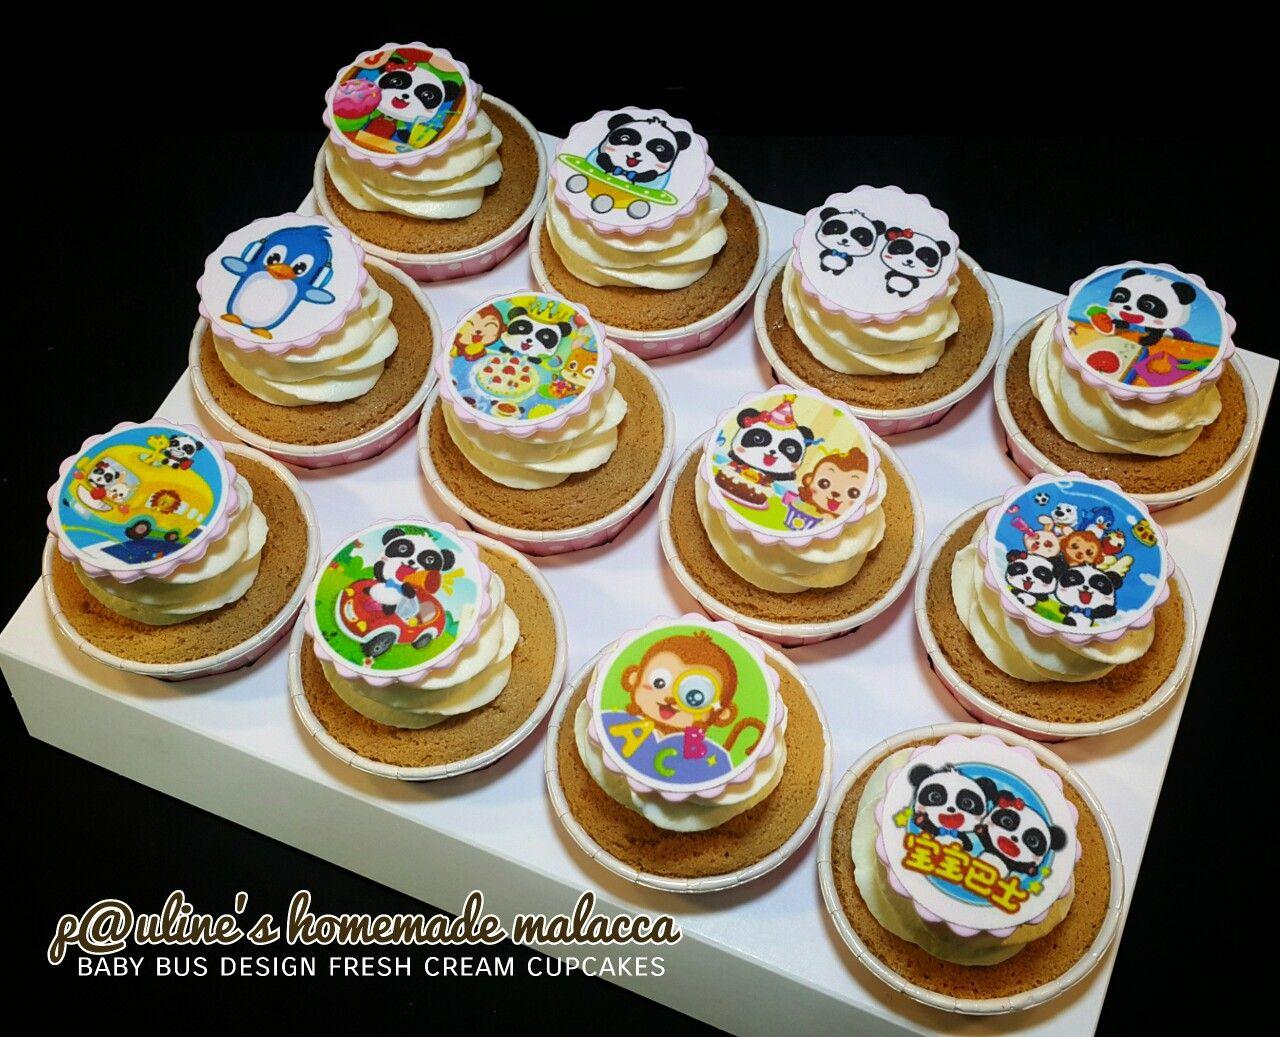 Baby bus / edible image / fresh cream cupcakes